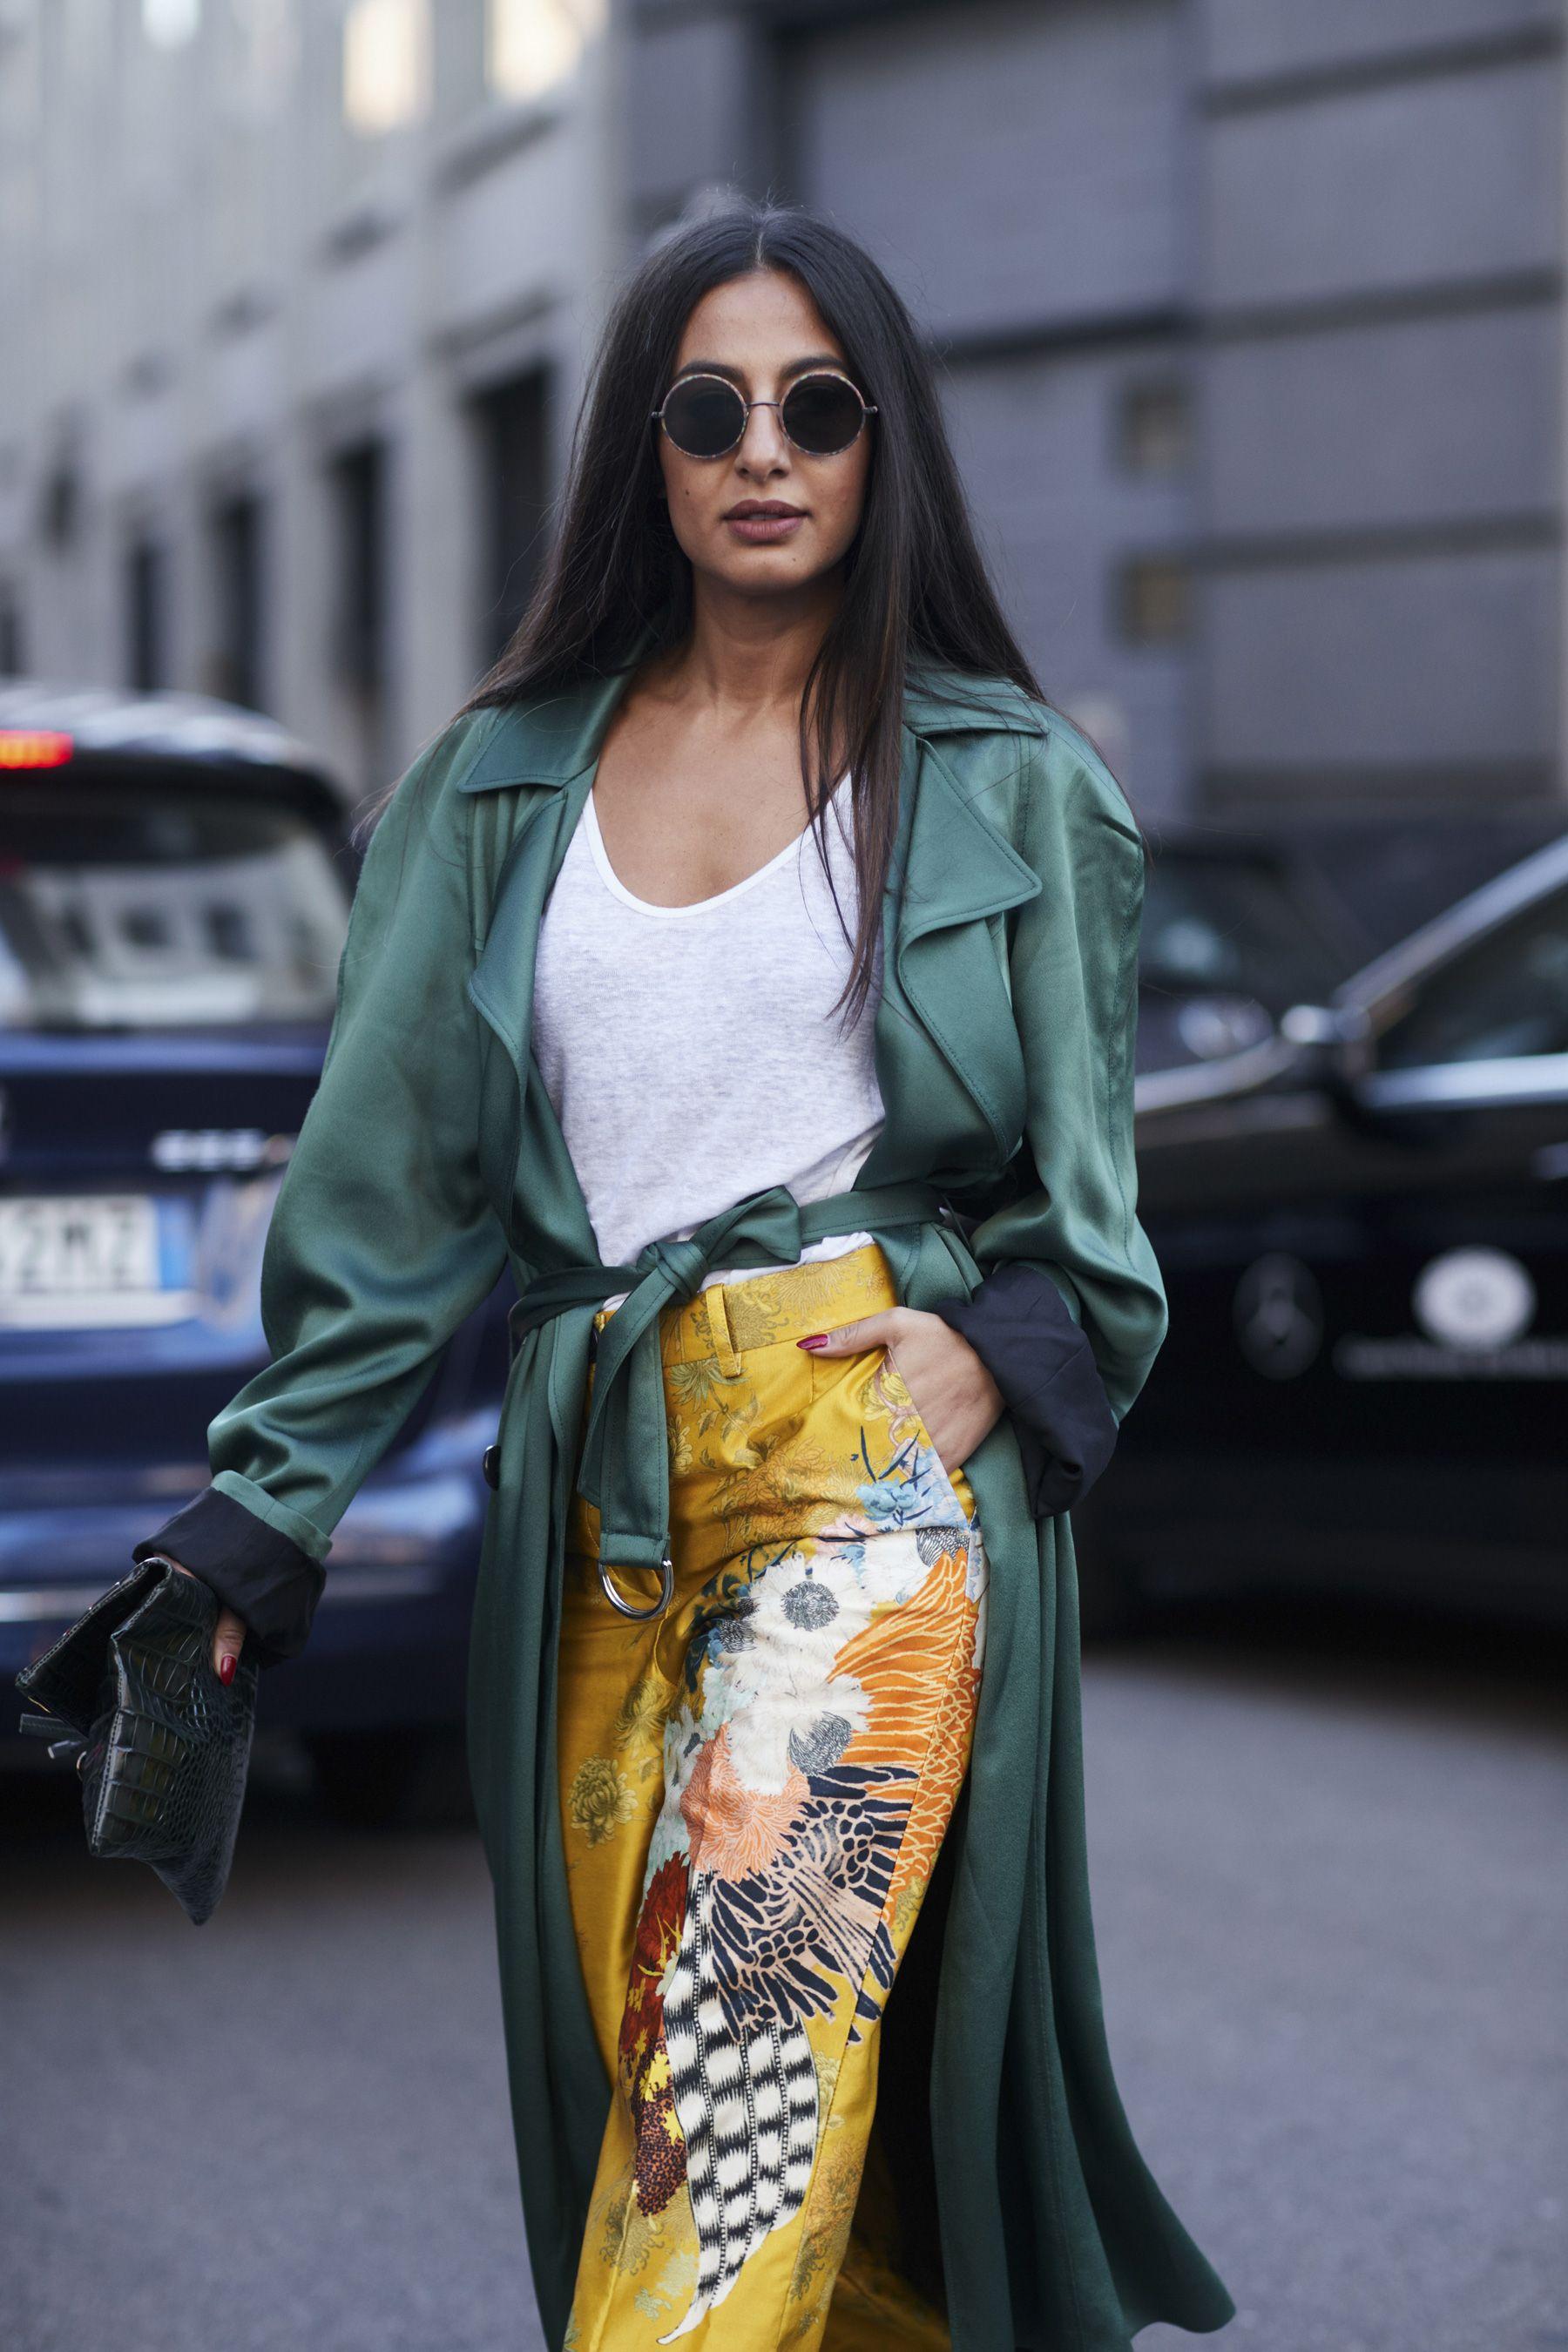 7b303225ff45 Milan Fashion Week Street Style Spring 2018 Day 2 Cont.